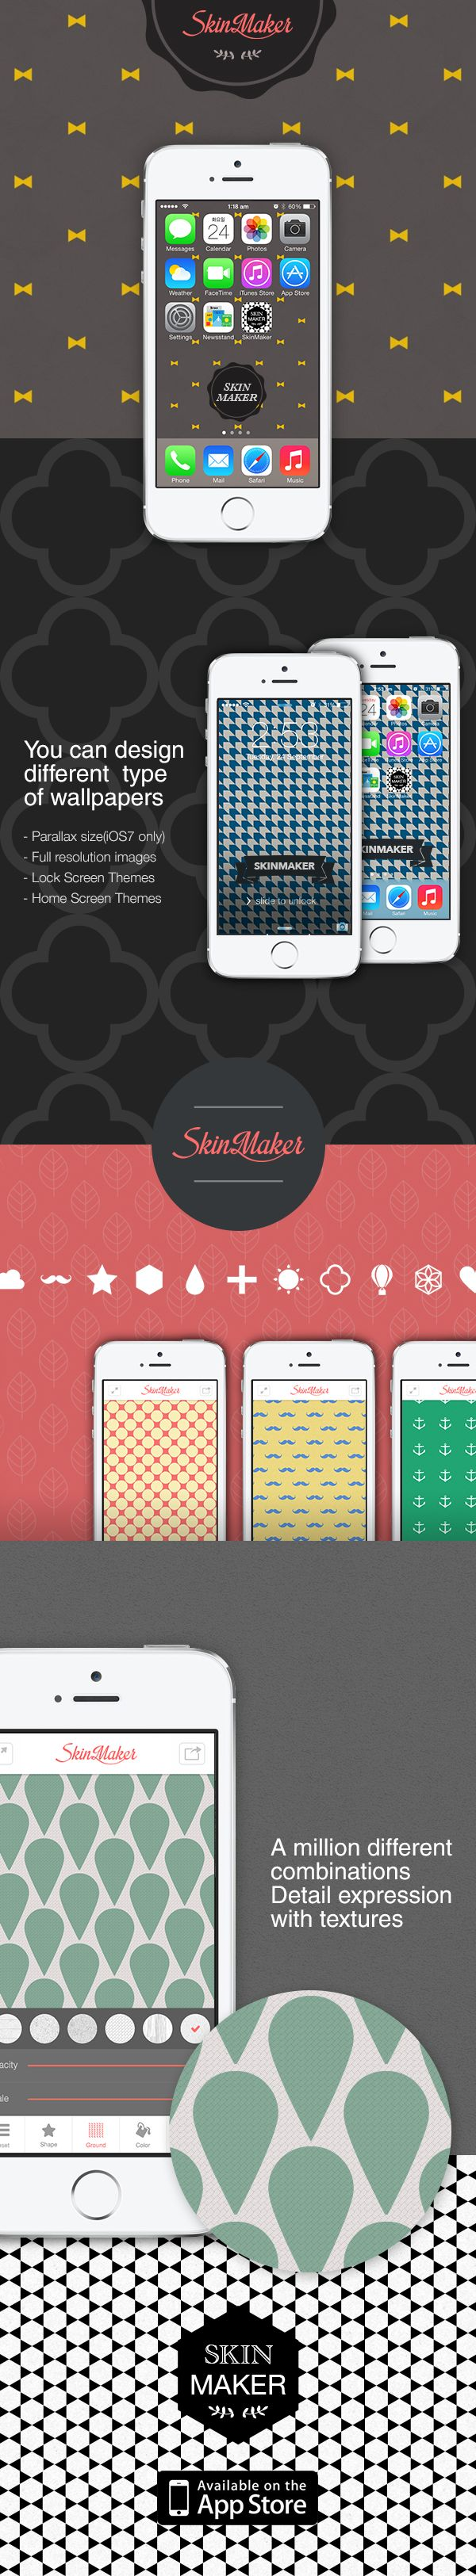 #SkinMaker https://itunes.apple.com/us/app/skinmaker-custom-wallpaper/id707436458?mt=8